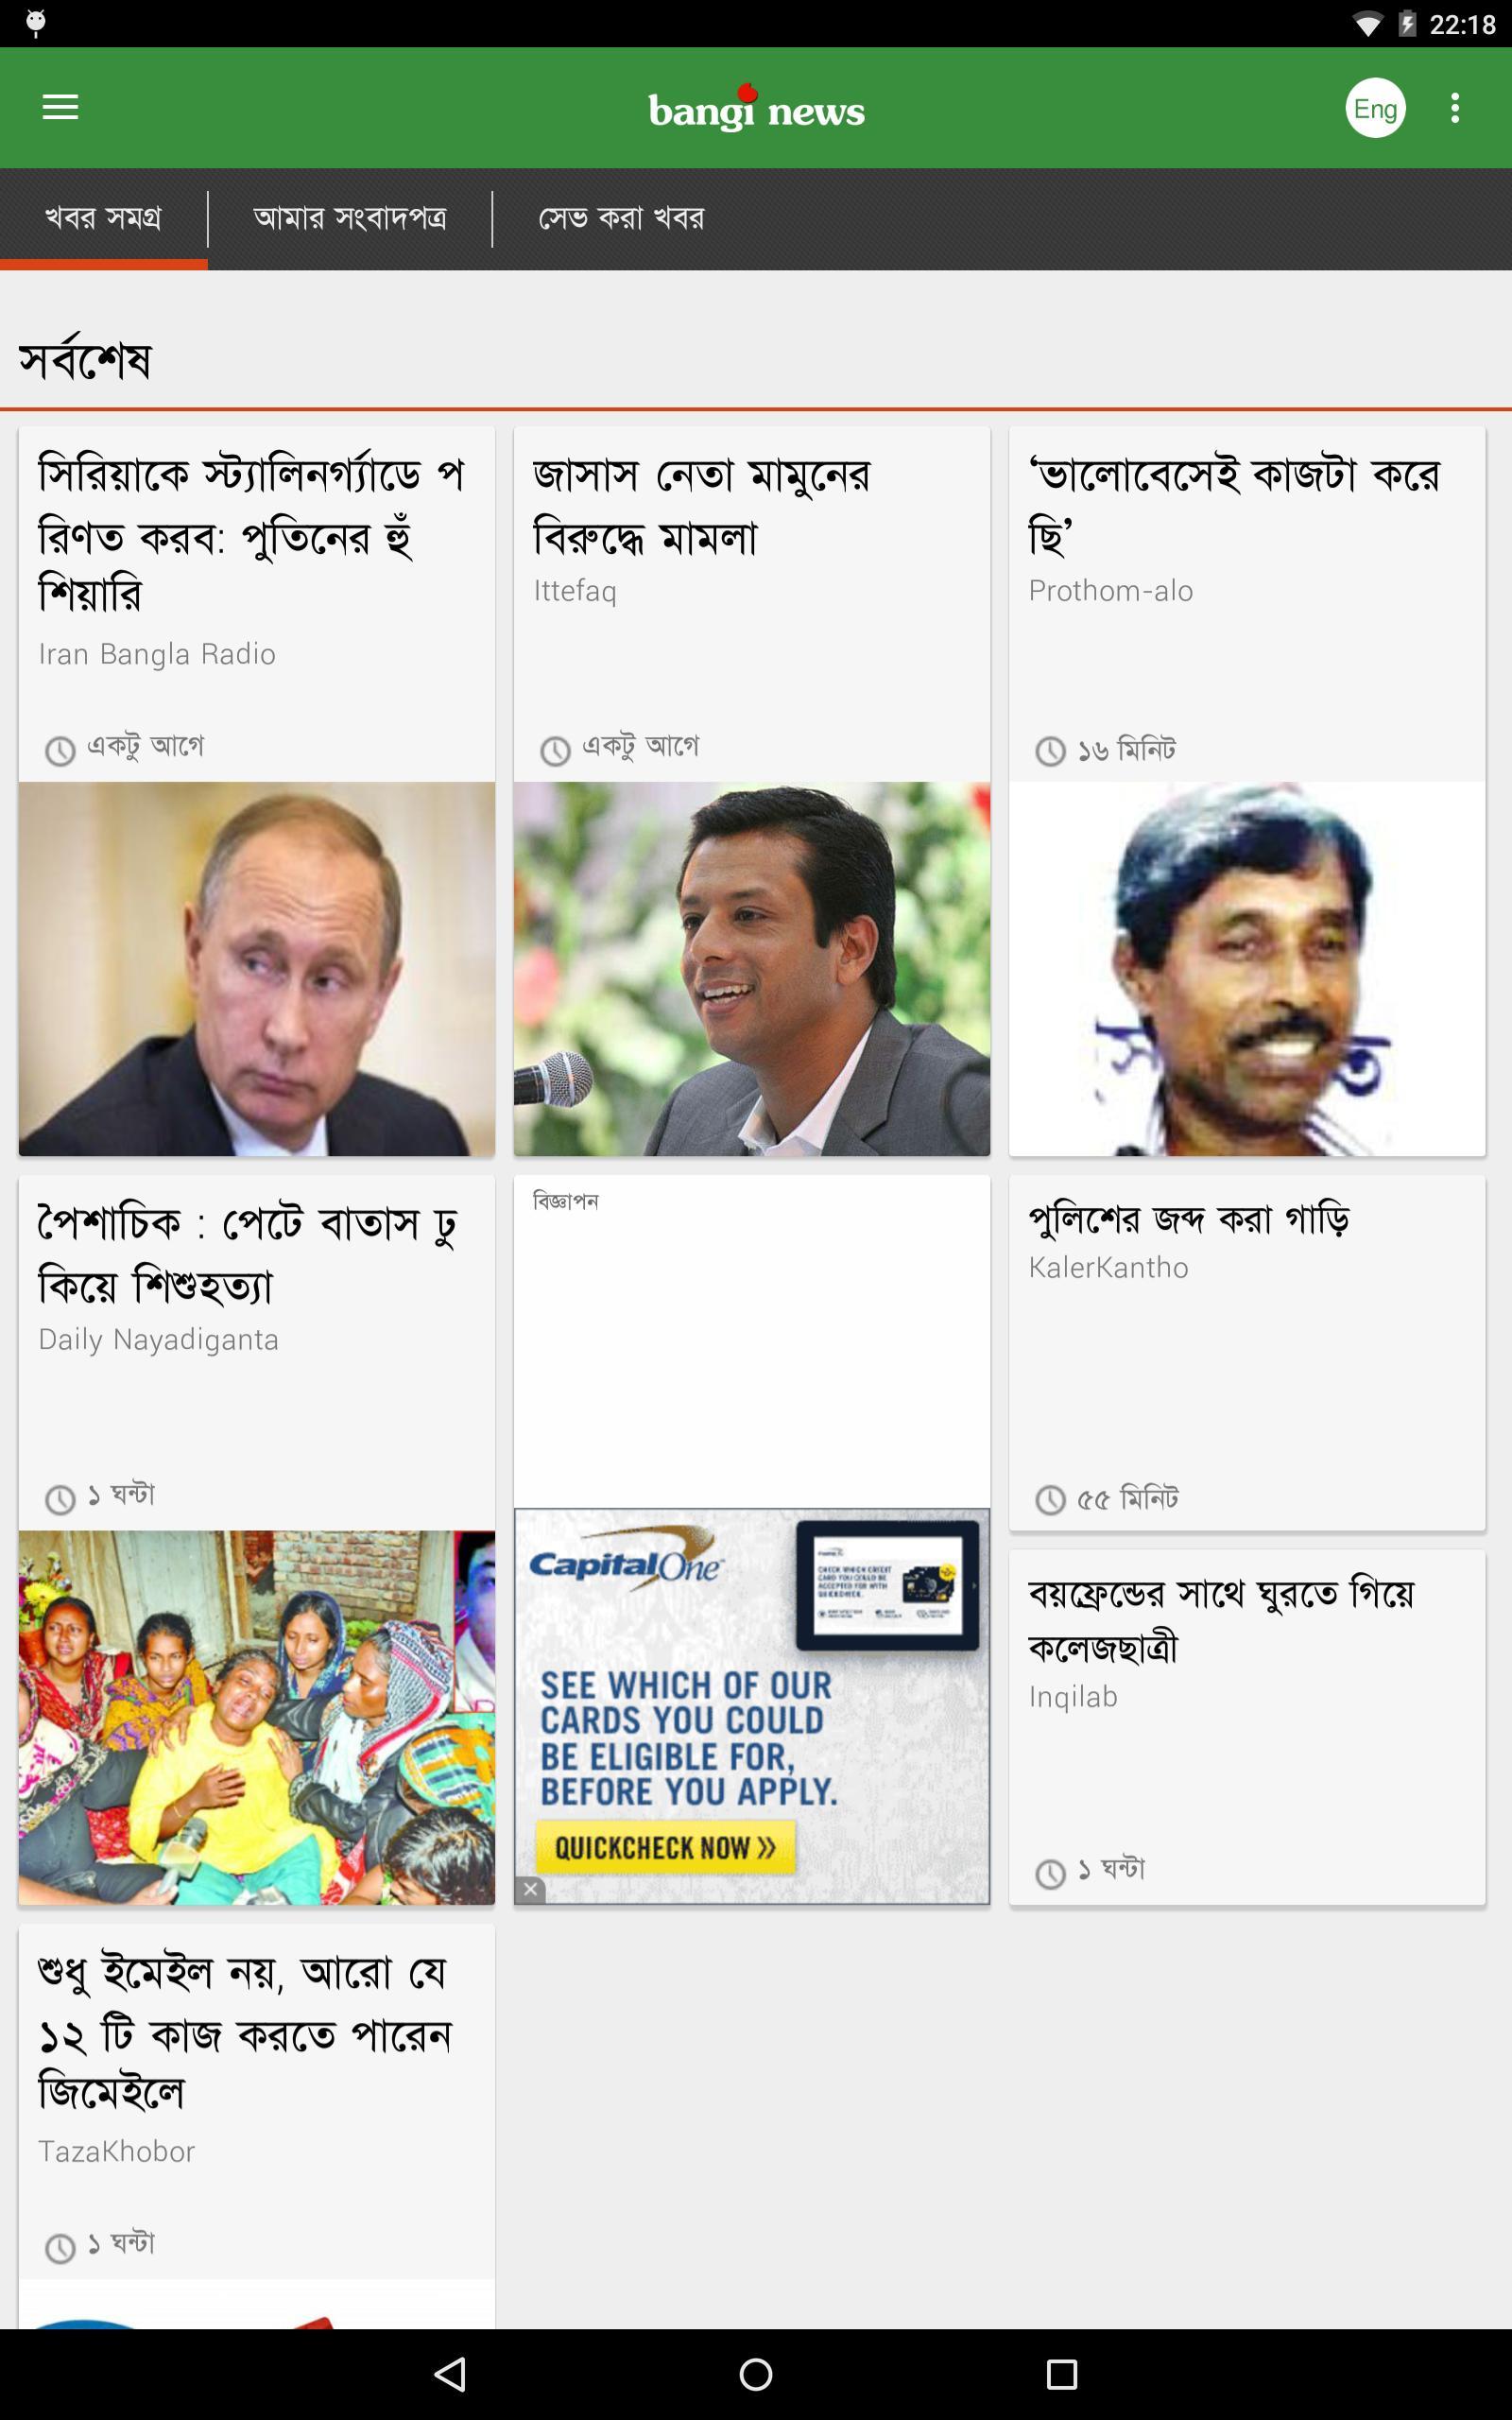 Bangla News & TV: Bangi News 12 تصوير الشاشة